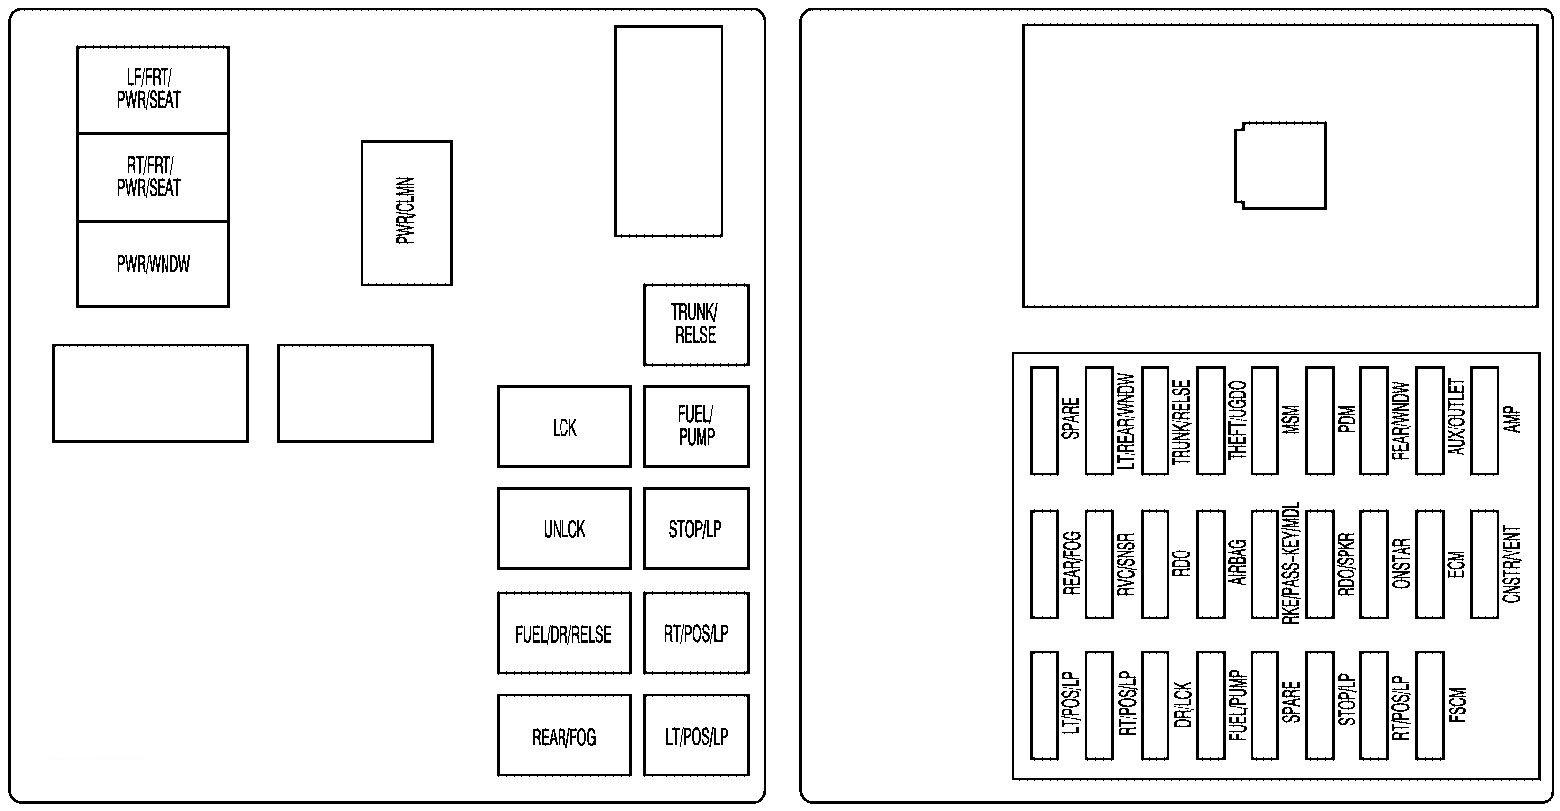 Cadillac Cts 2009 Fuse Box Diagram Auto Genius